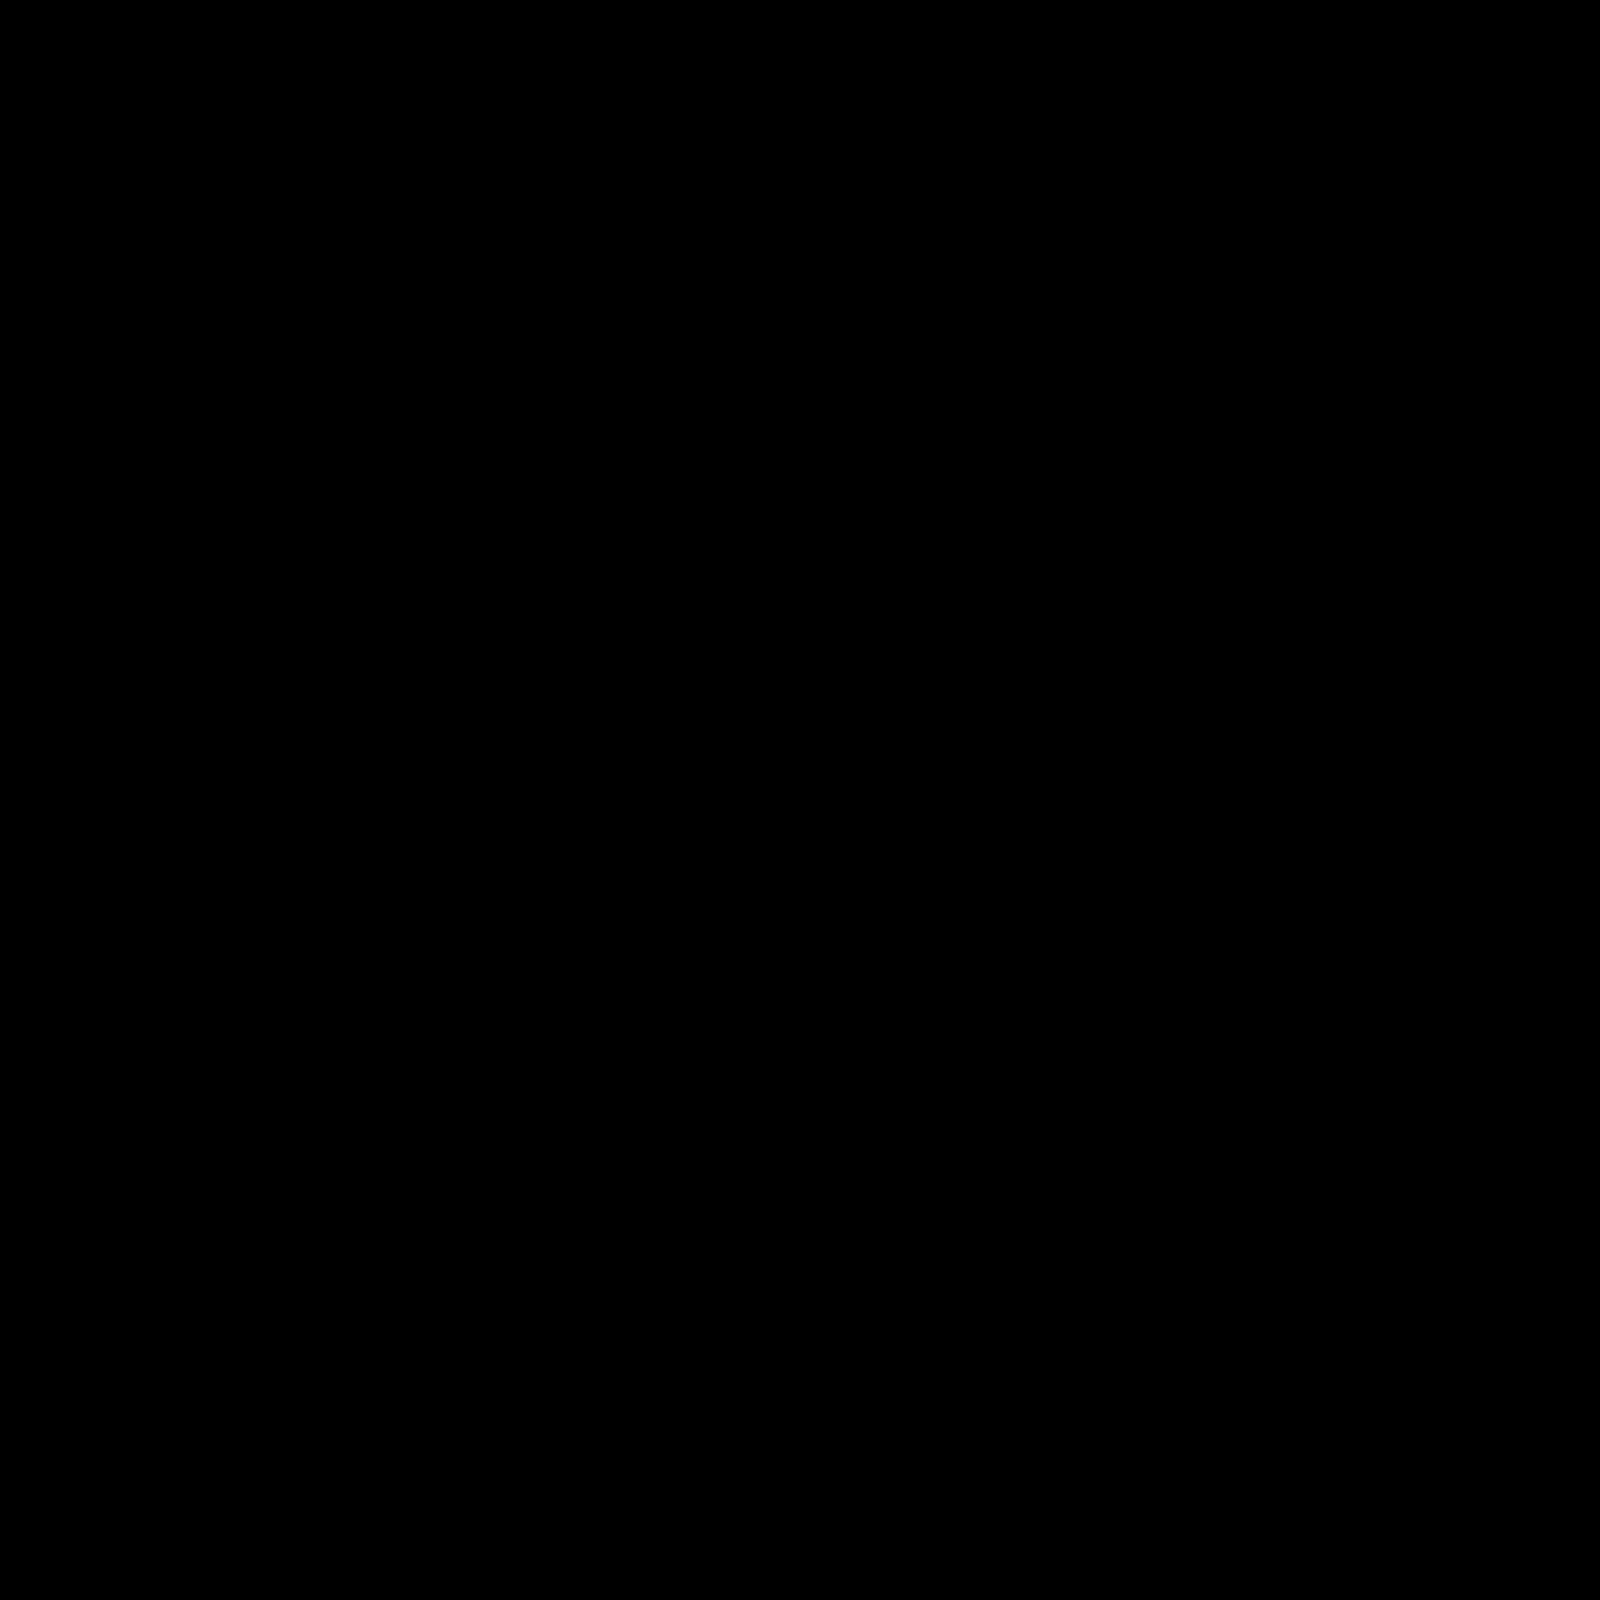 1 circulado C icon